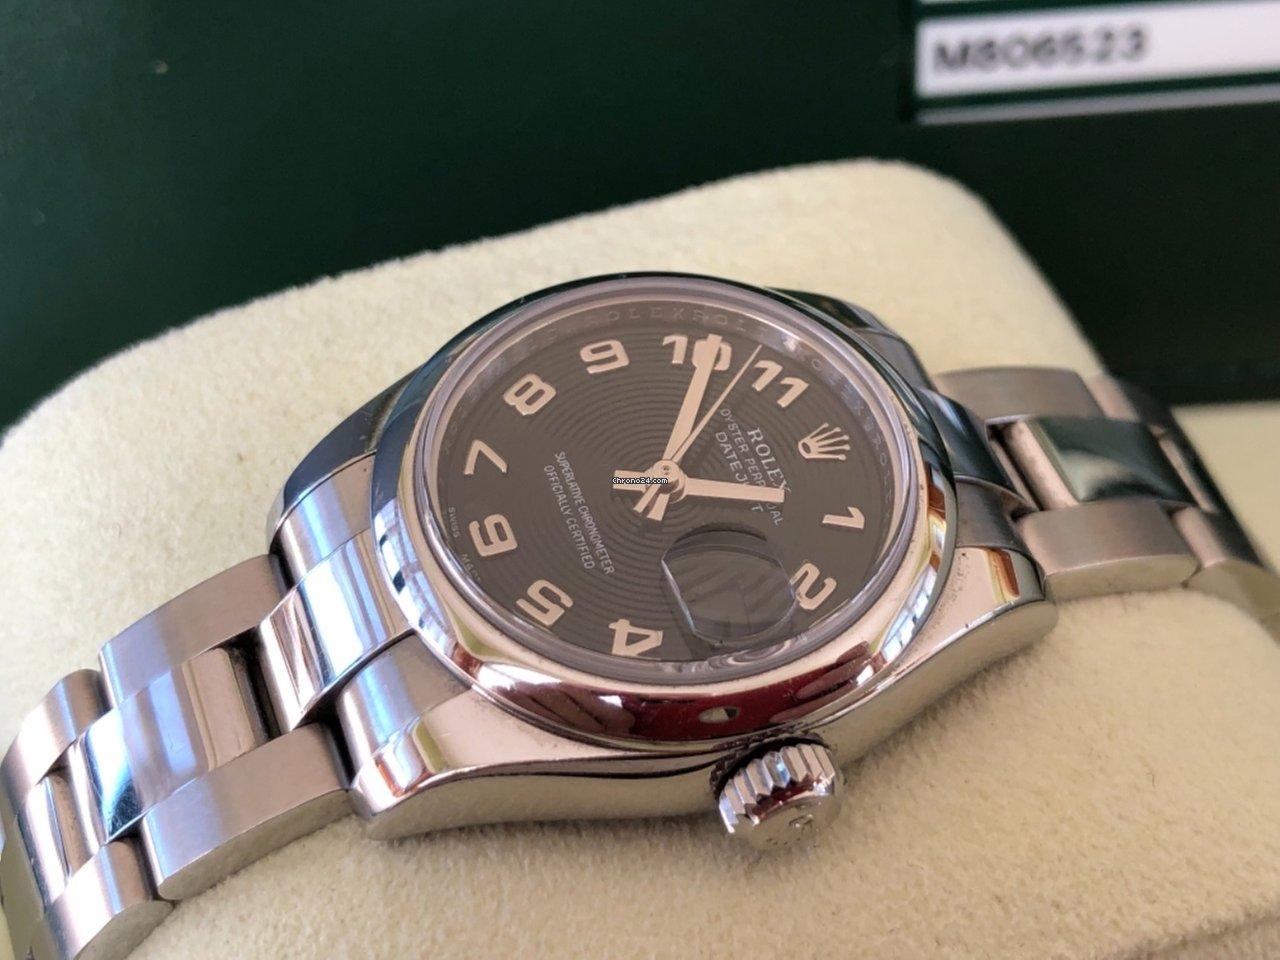 Női Rolex órák árai  3cc0361f8e